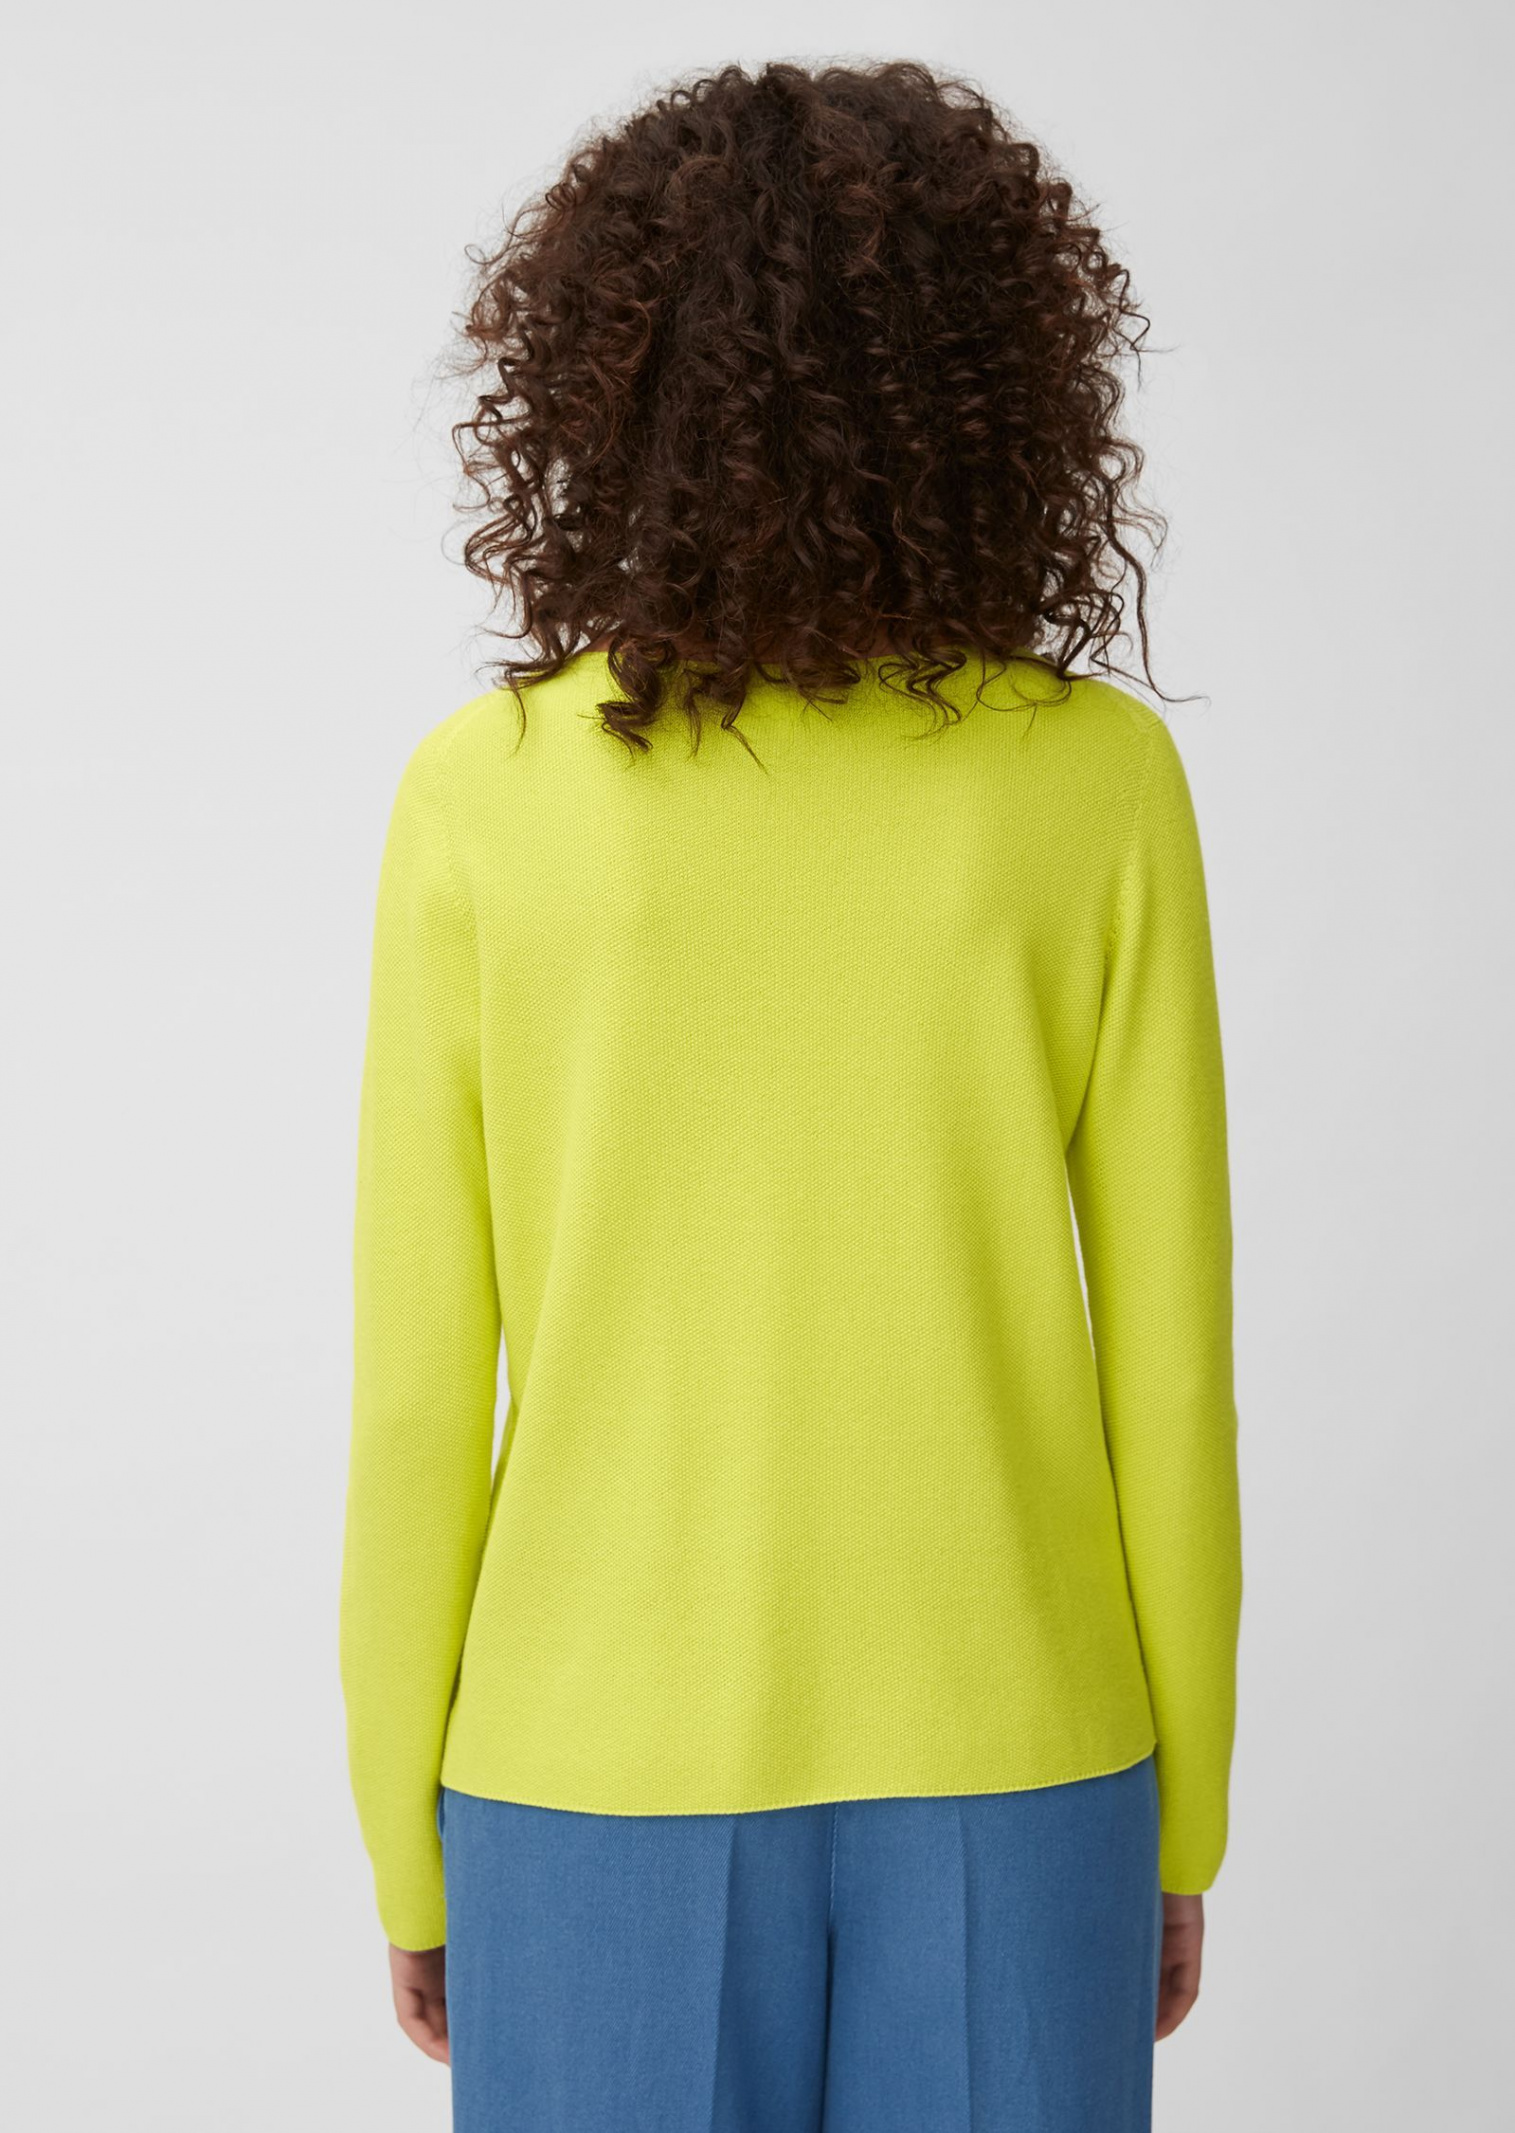 Кофты и свитера женские MARC O'POLO модель PF4008 , 2017